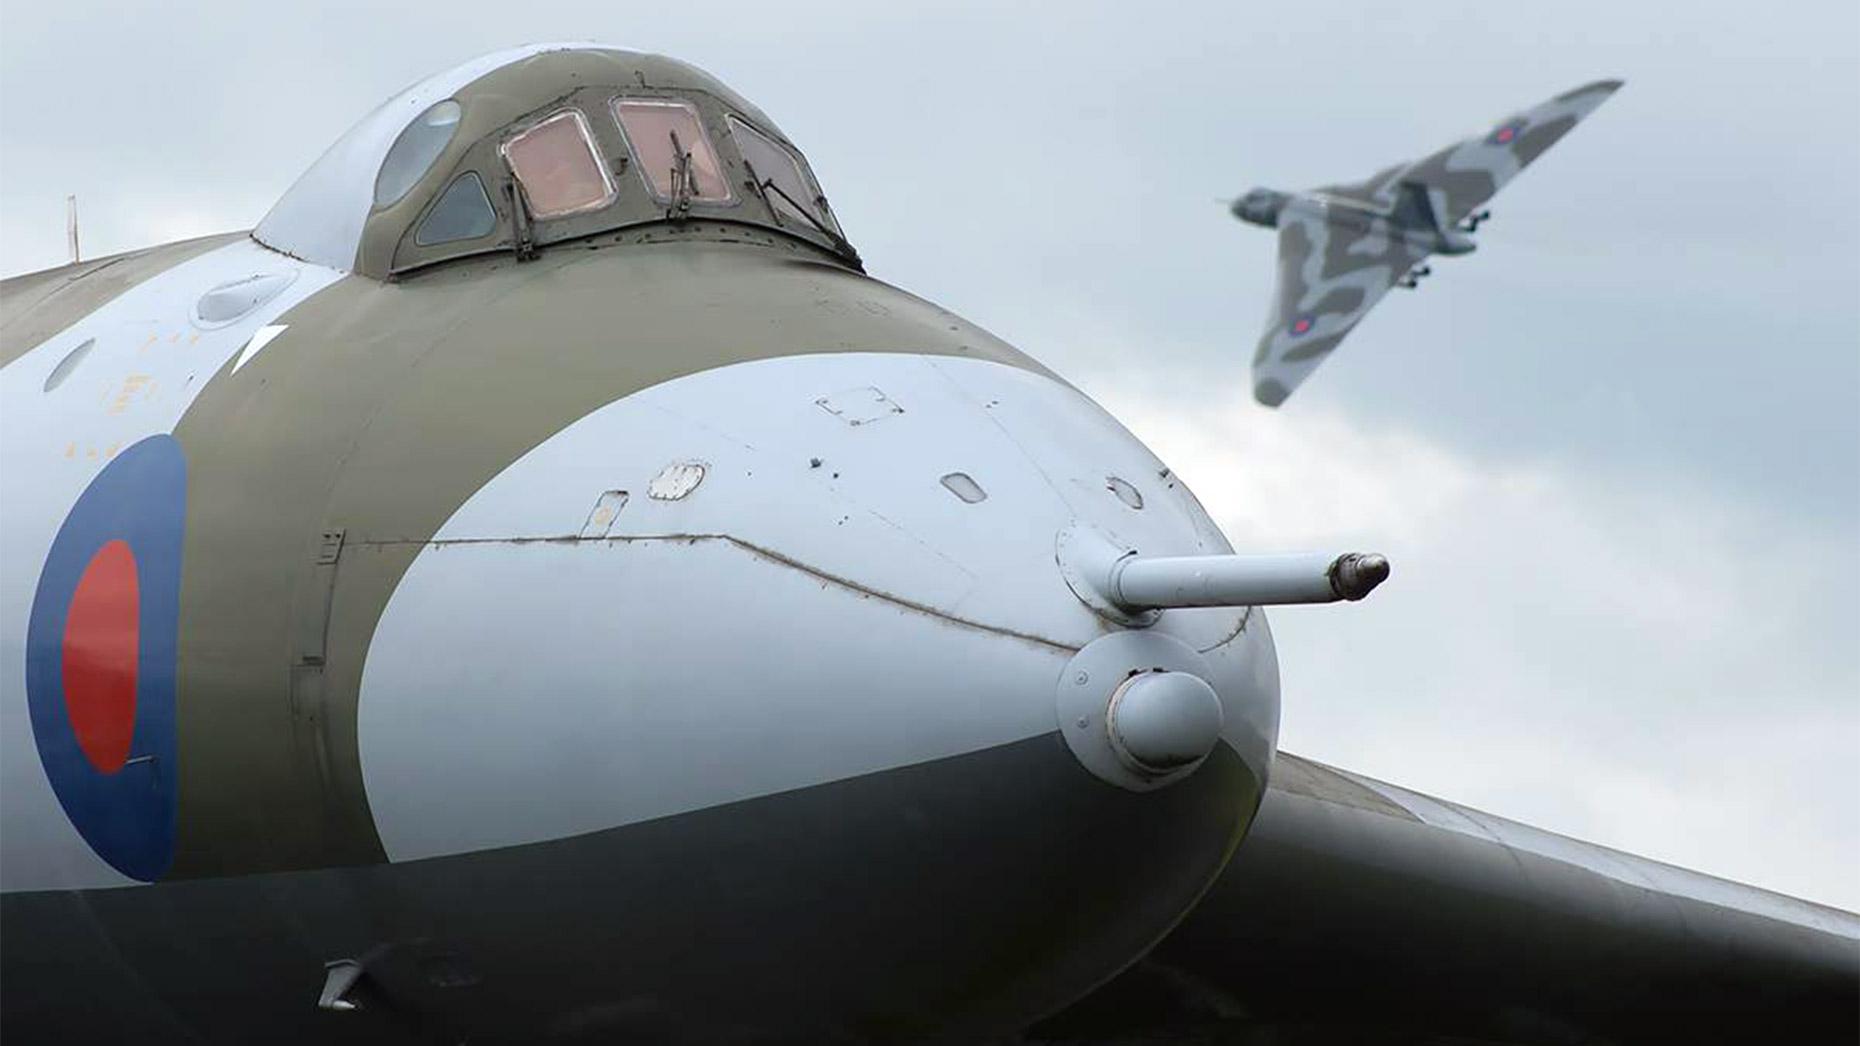 The Vulcan flypast over RAF Waddington on June 28, 2015. Photo: Daniel Kennedy